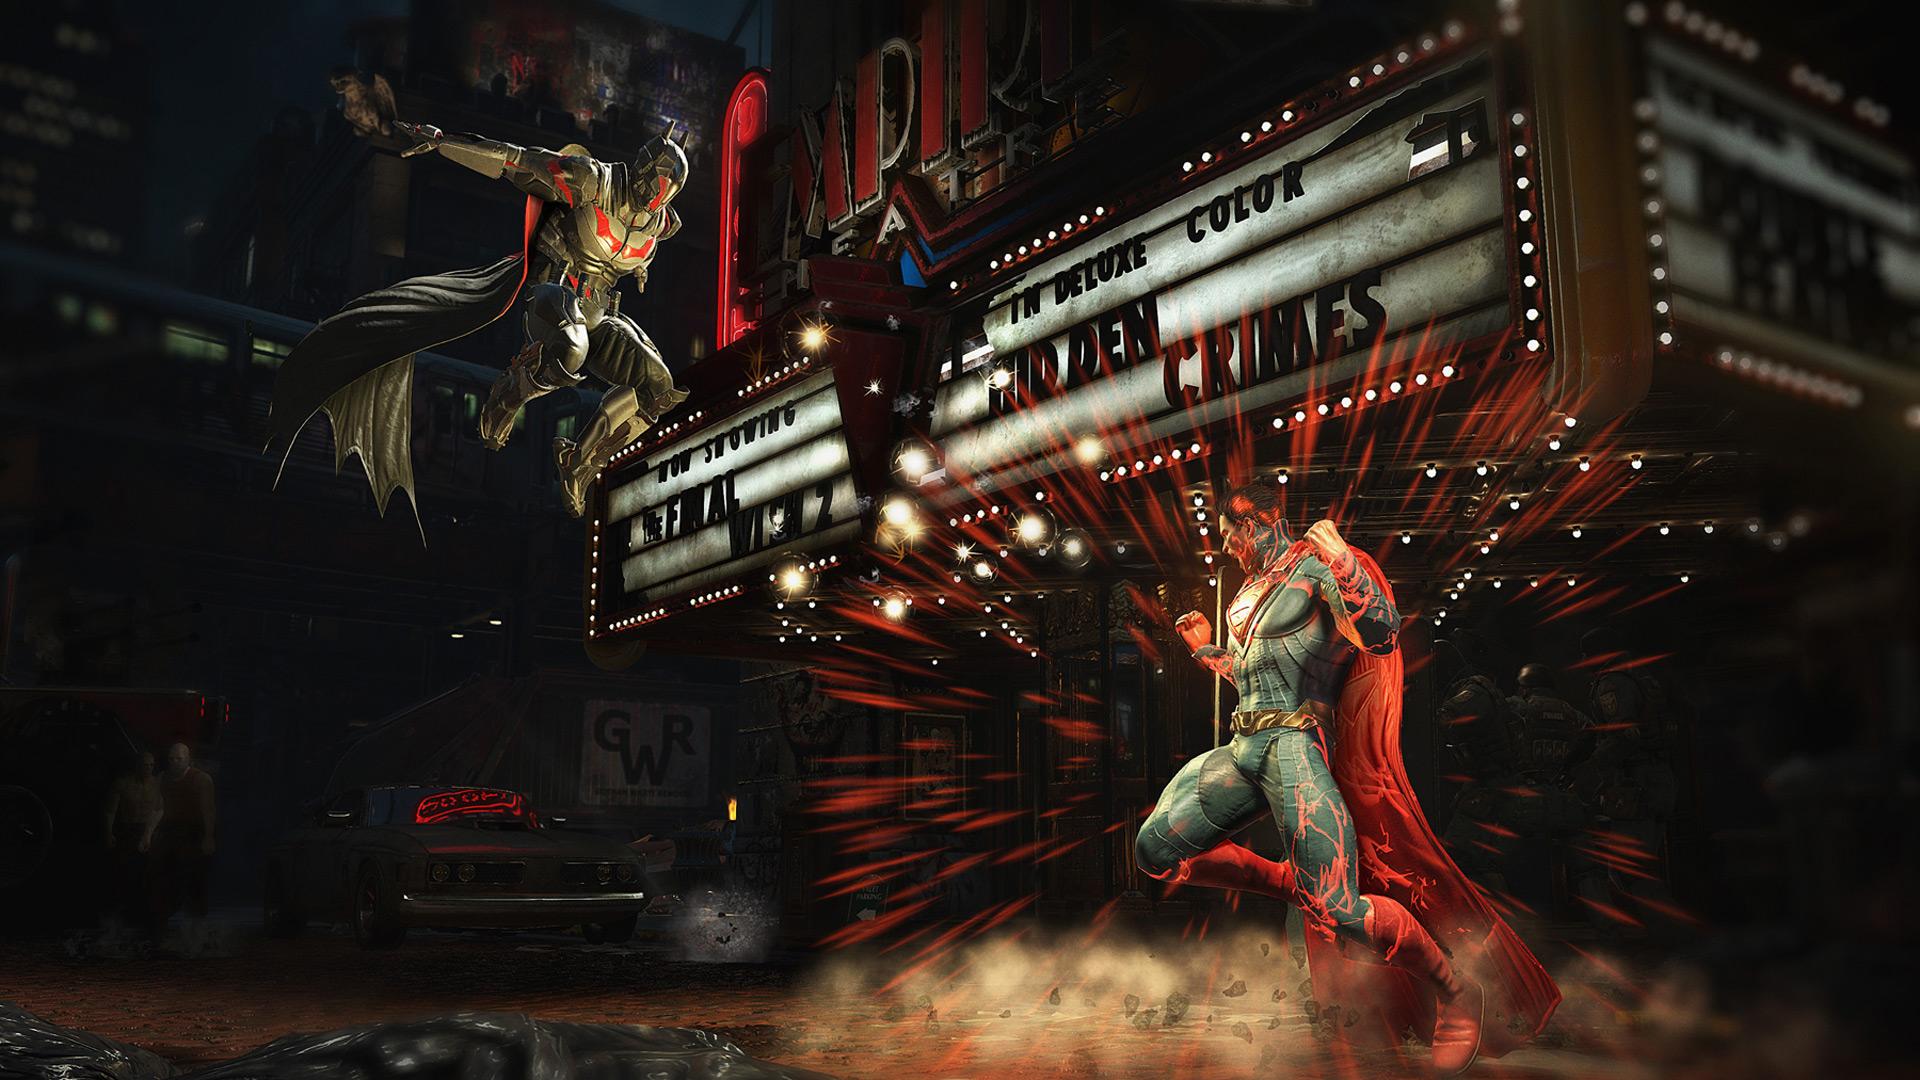 Injustice 2 Superman Hd Games 4k Wallpapers Images: Batman V Superman Injustice 2, HD Games, 4k Wallpapers